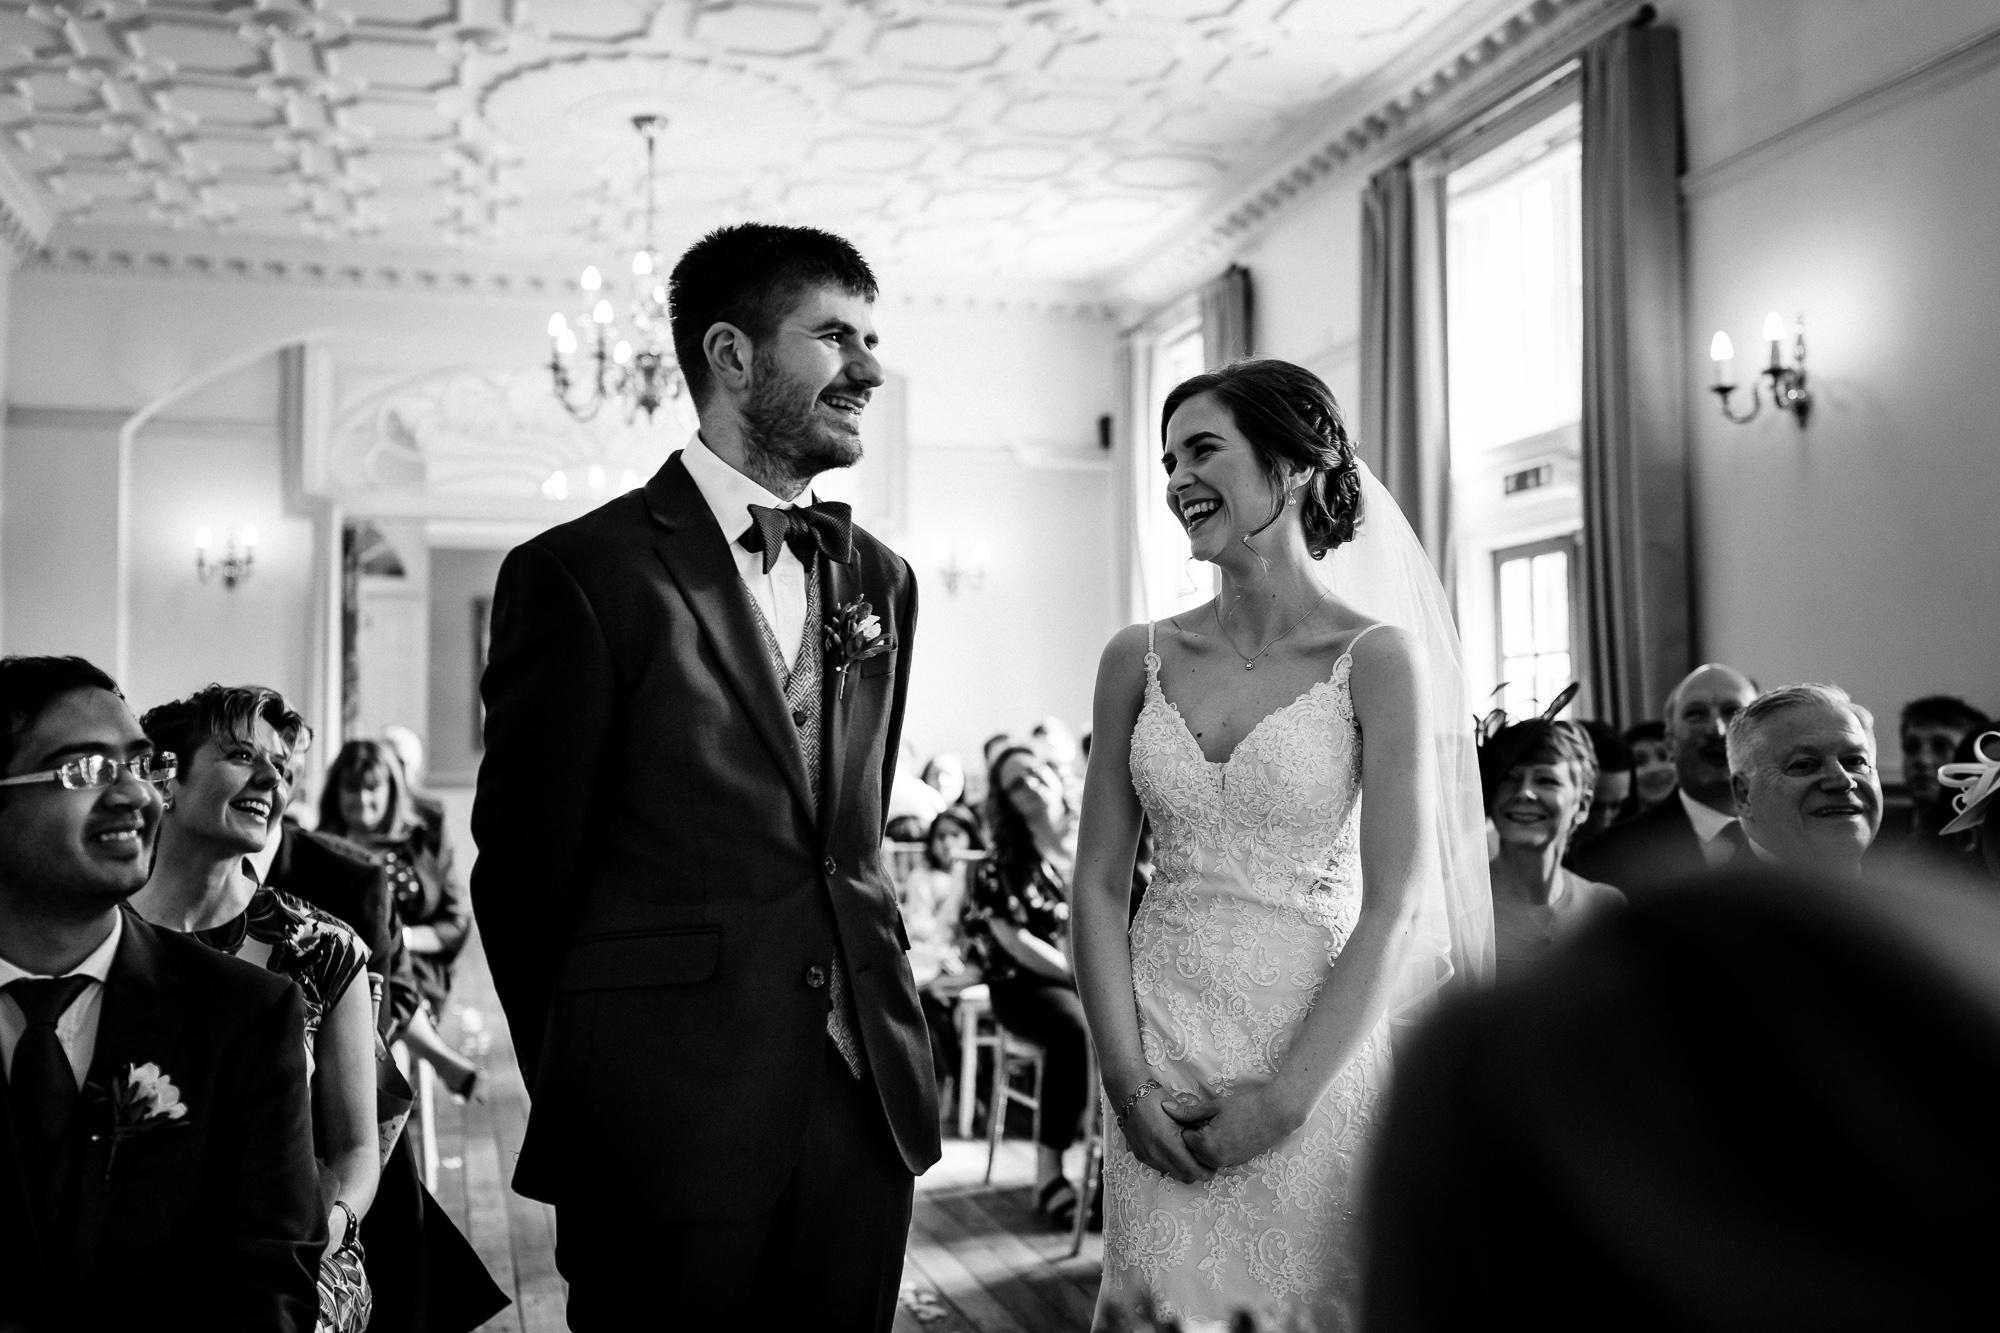 Nunsmere Hall Hotel Wedding photograhpy in cheshire wedding photographer (18 of 42).jpg